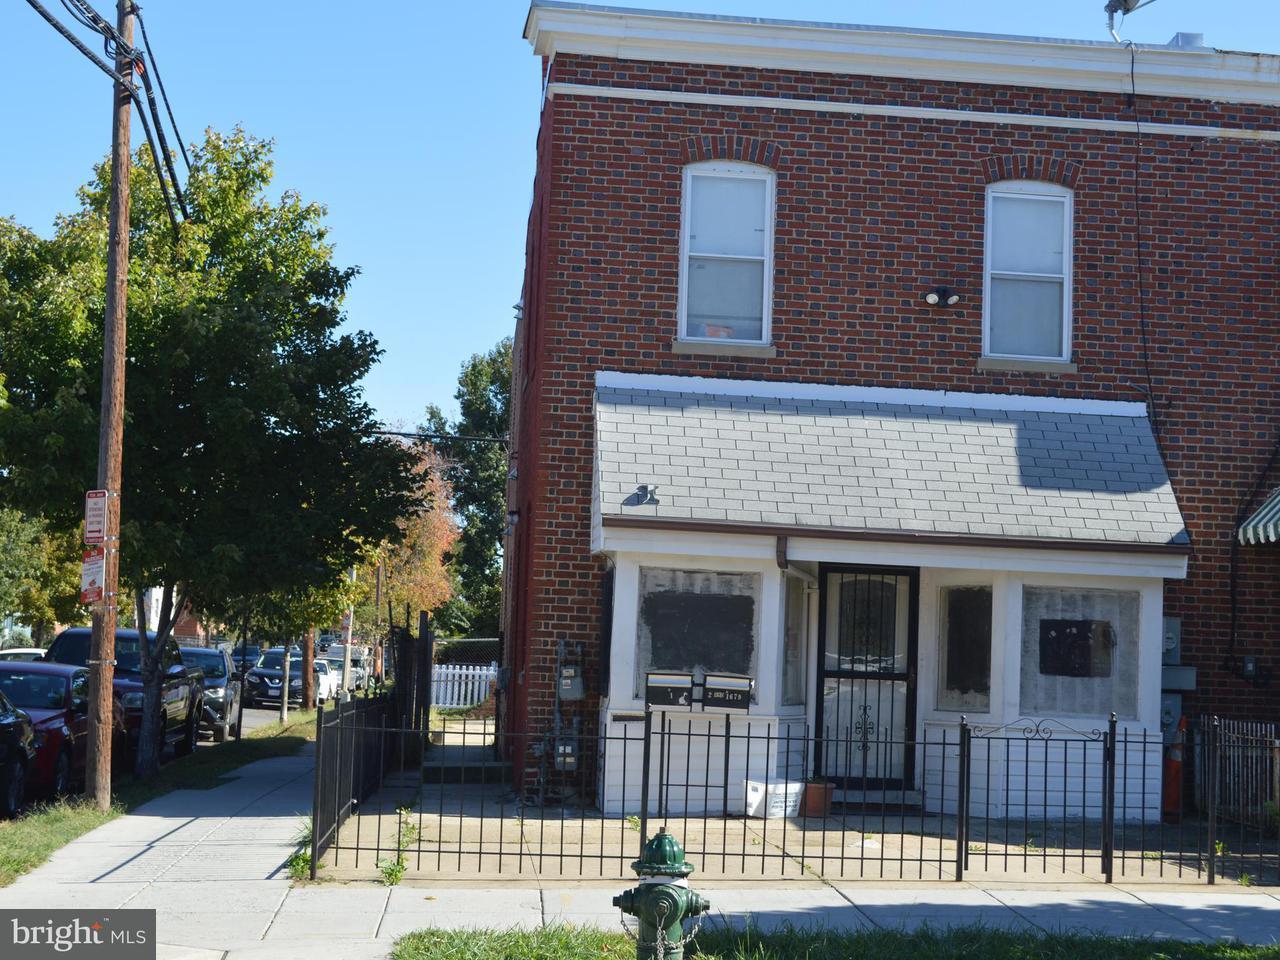 Multi-Family Home for Sale at 1679 MONTELLO AVE NE 1679 MONTELLO AVE NE Washington, District Of Columbia 20002 United States